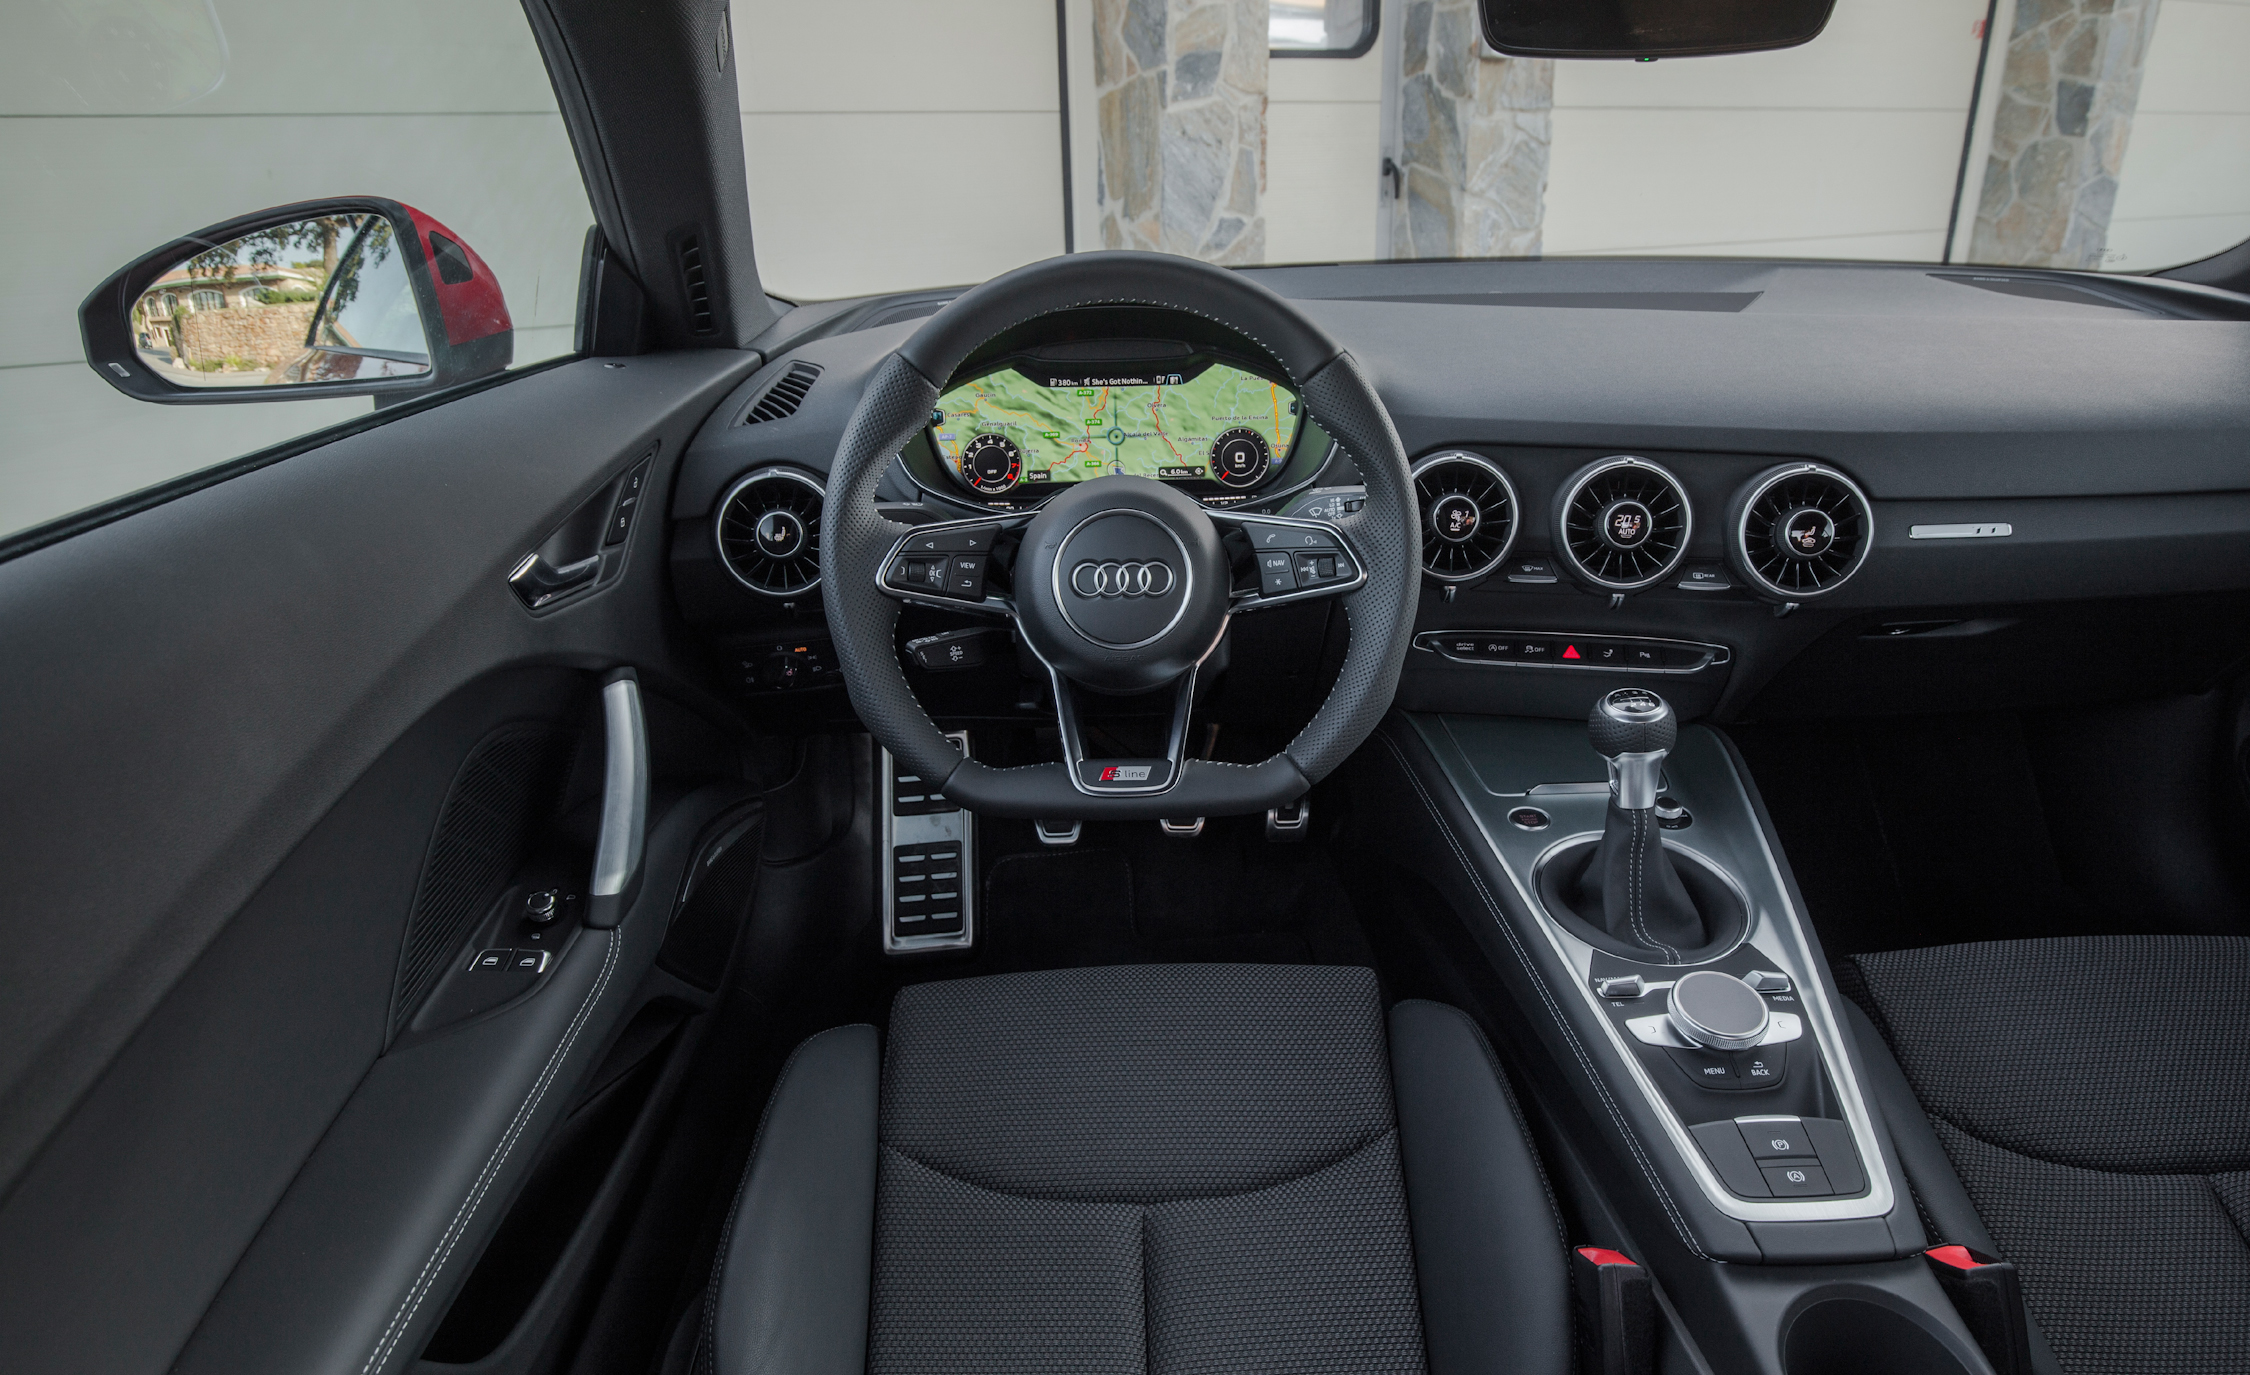 2016 Audi TT Coupe Interior Cockpit